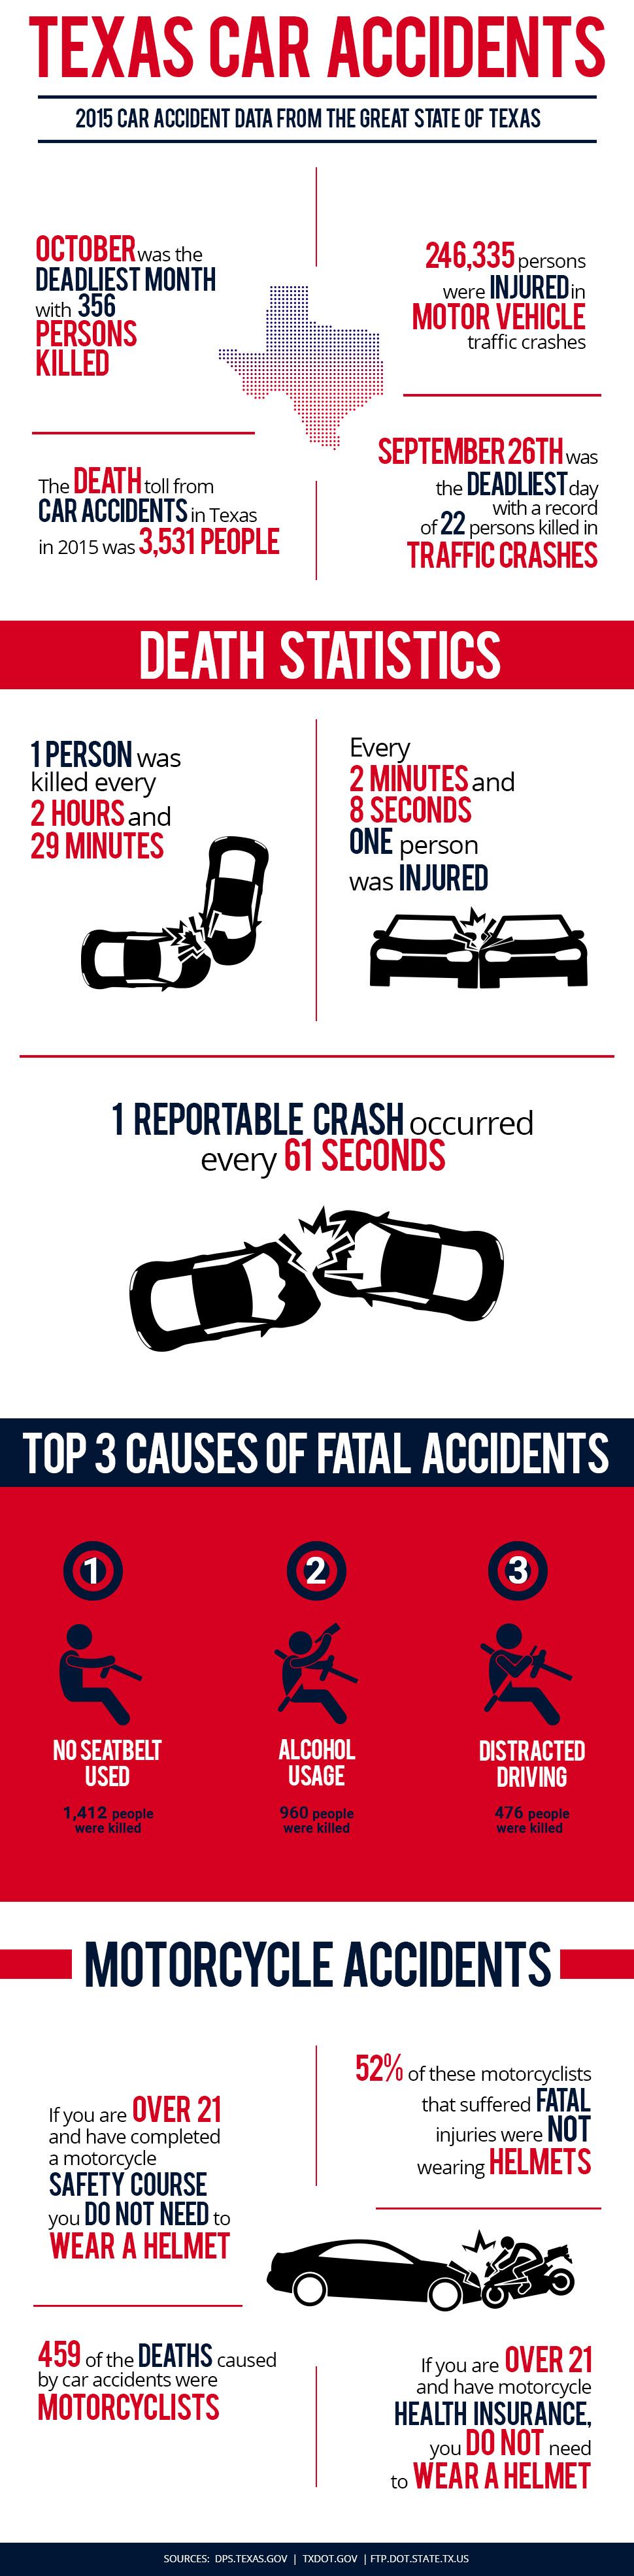 Texas Car Accidents